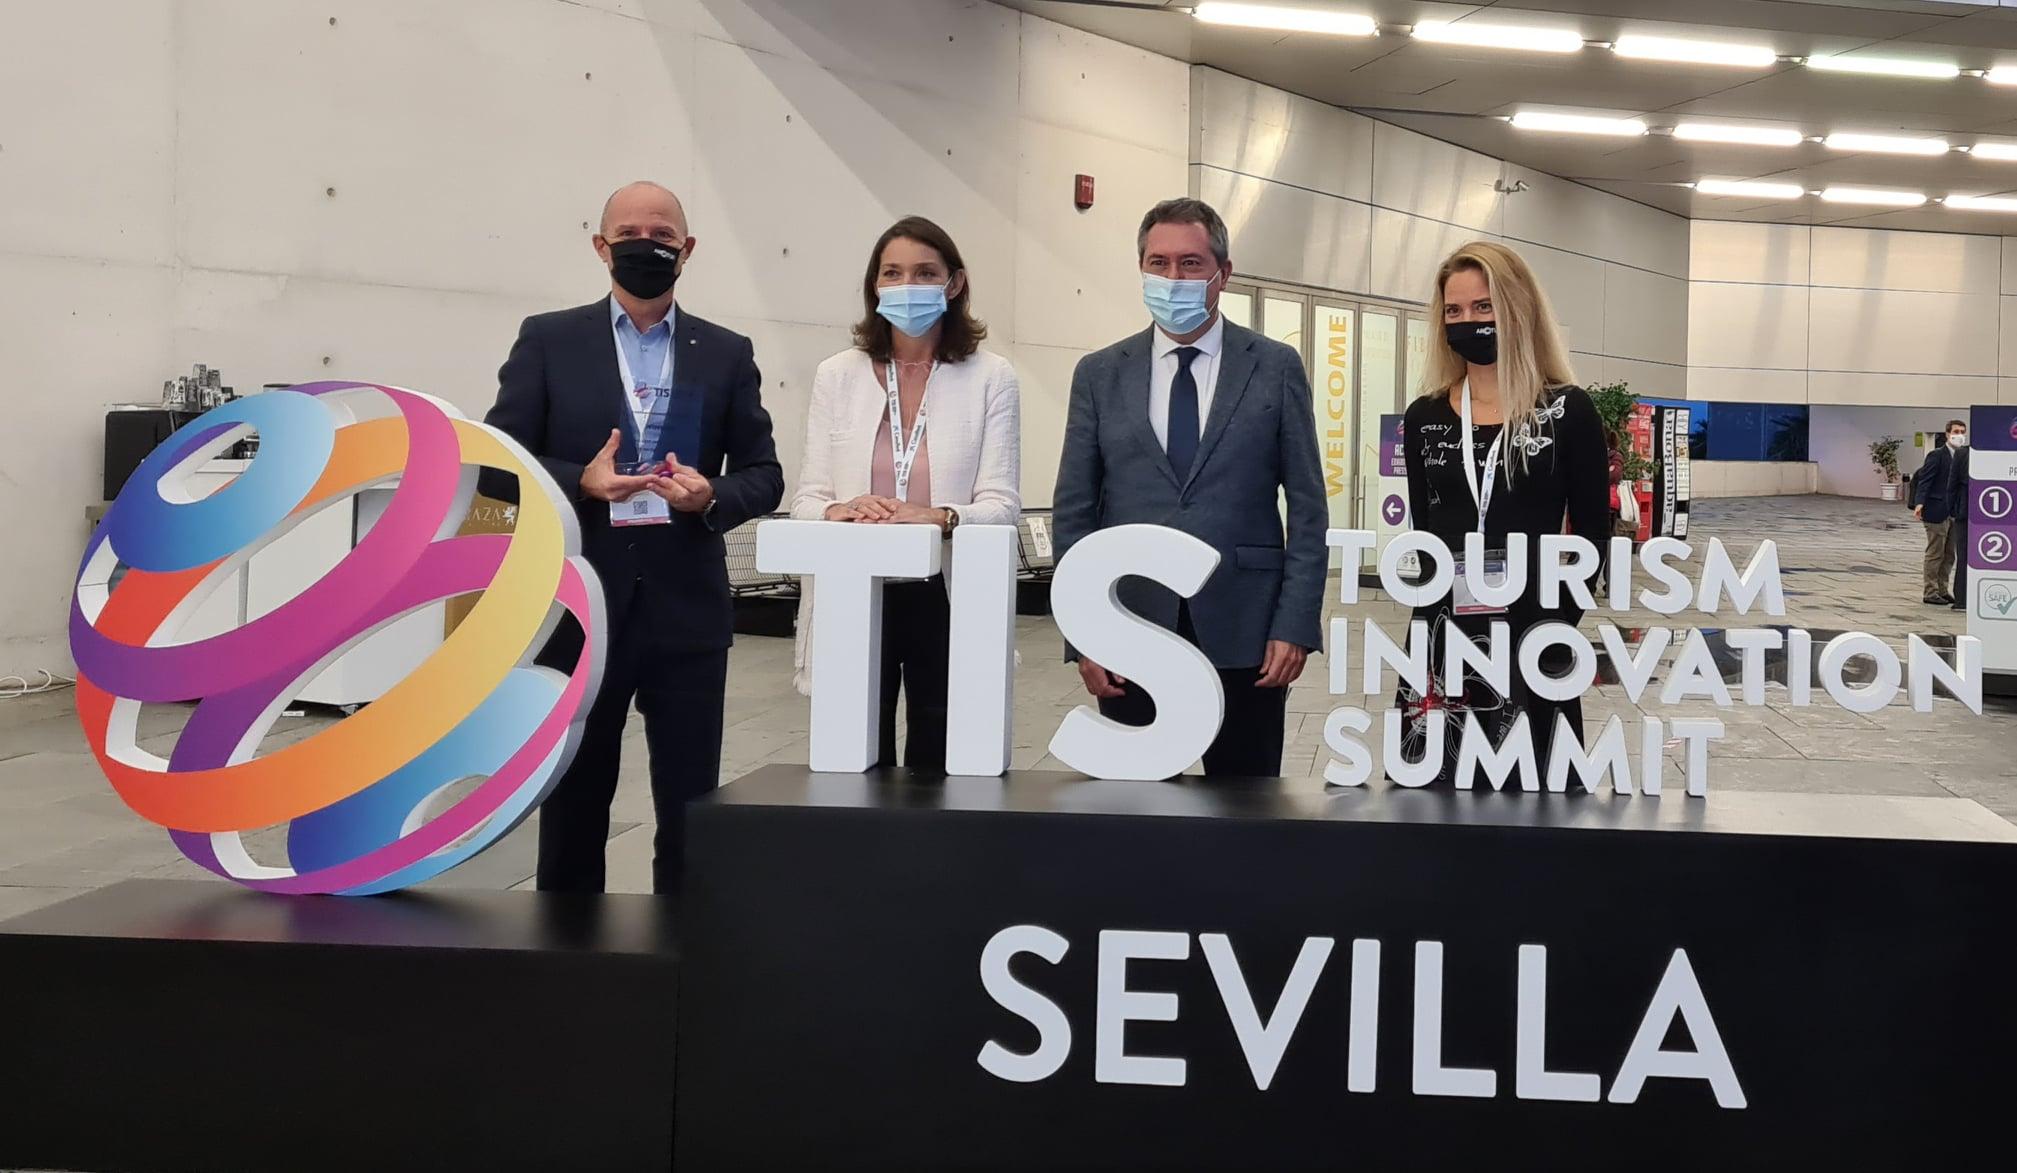 TIS Sevilla